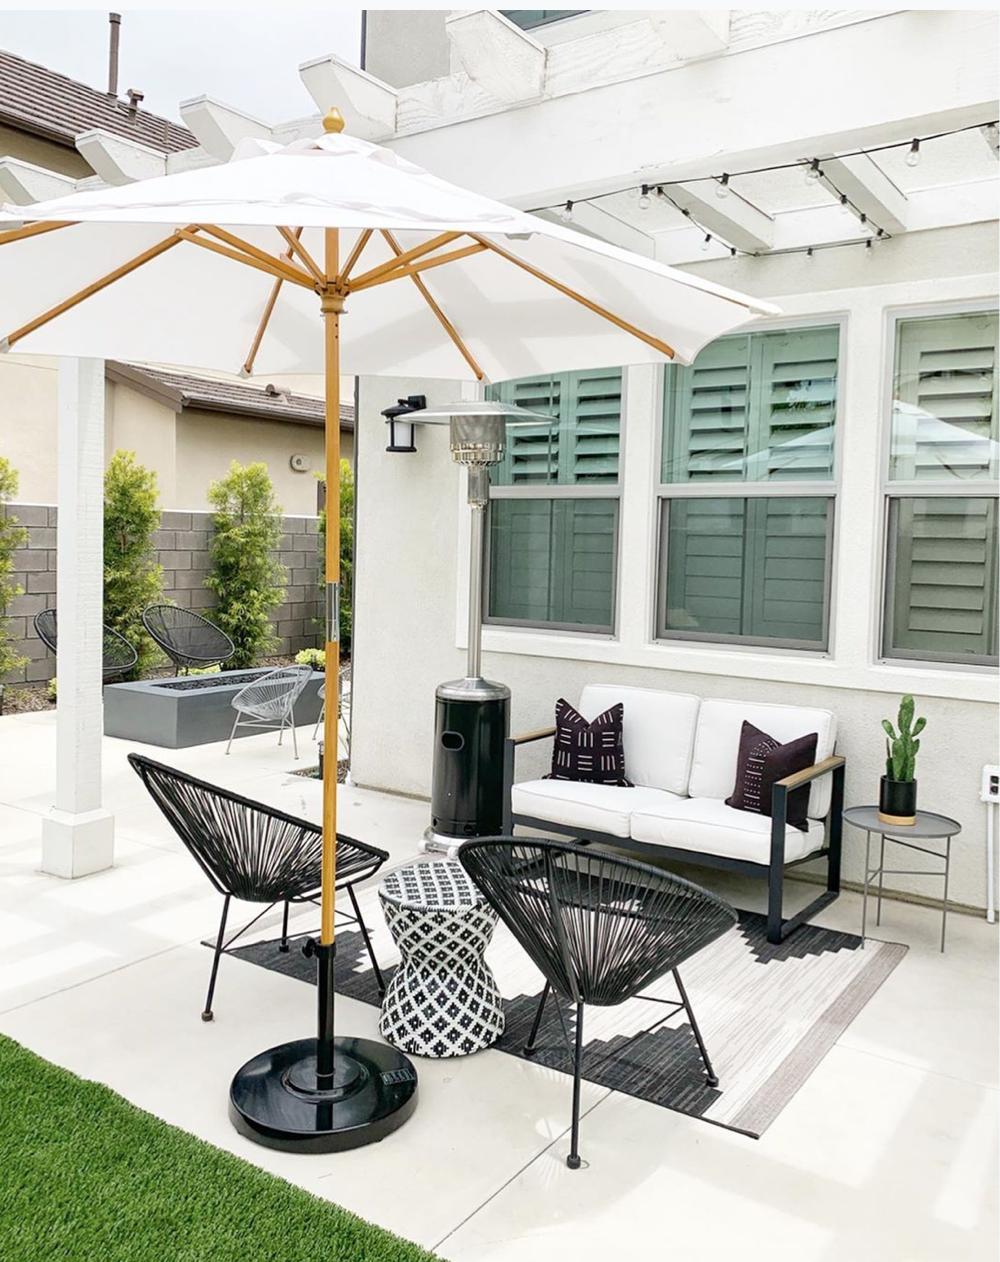 Az Patio Heaters Hlds01 Sshgt 87 Tall Two Tone Patio Heater With Table Patio Heater Patio Best Patio Umbrella